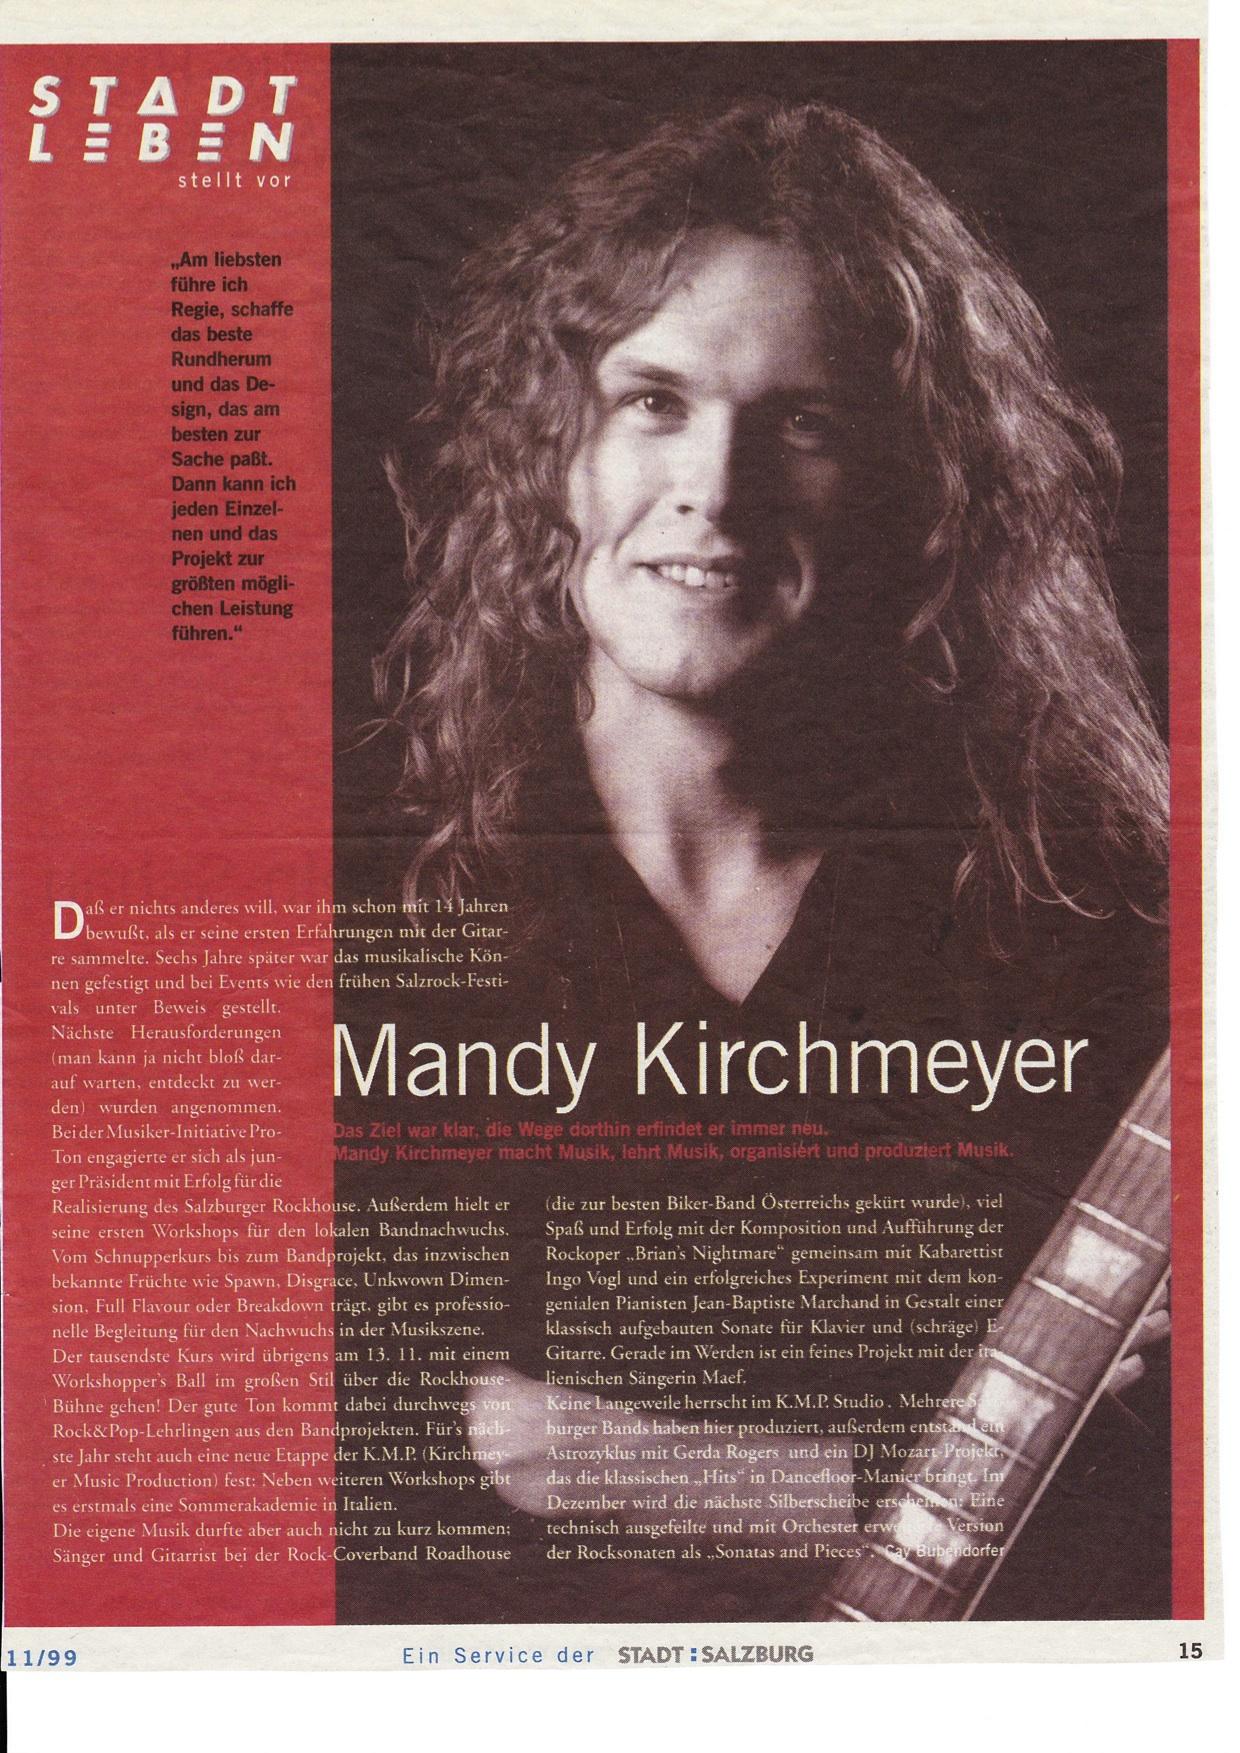 MandyKirchmeyer.jpg